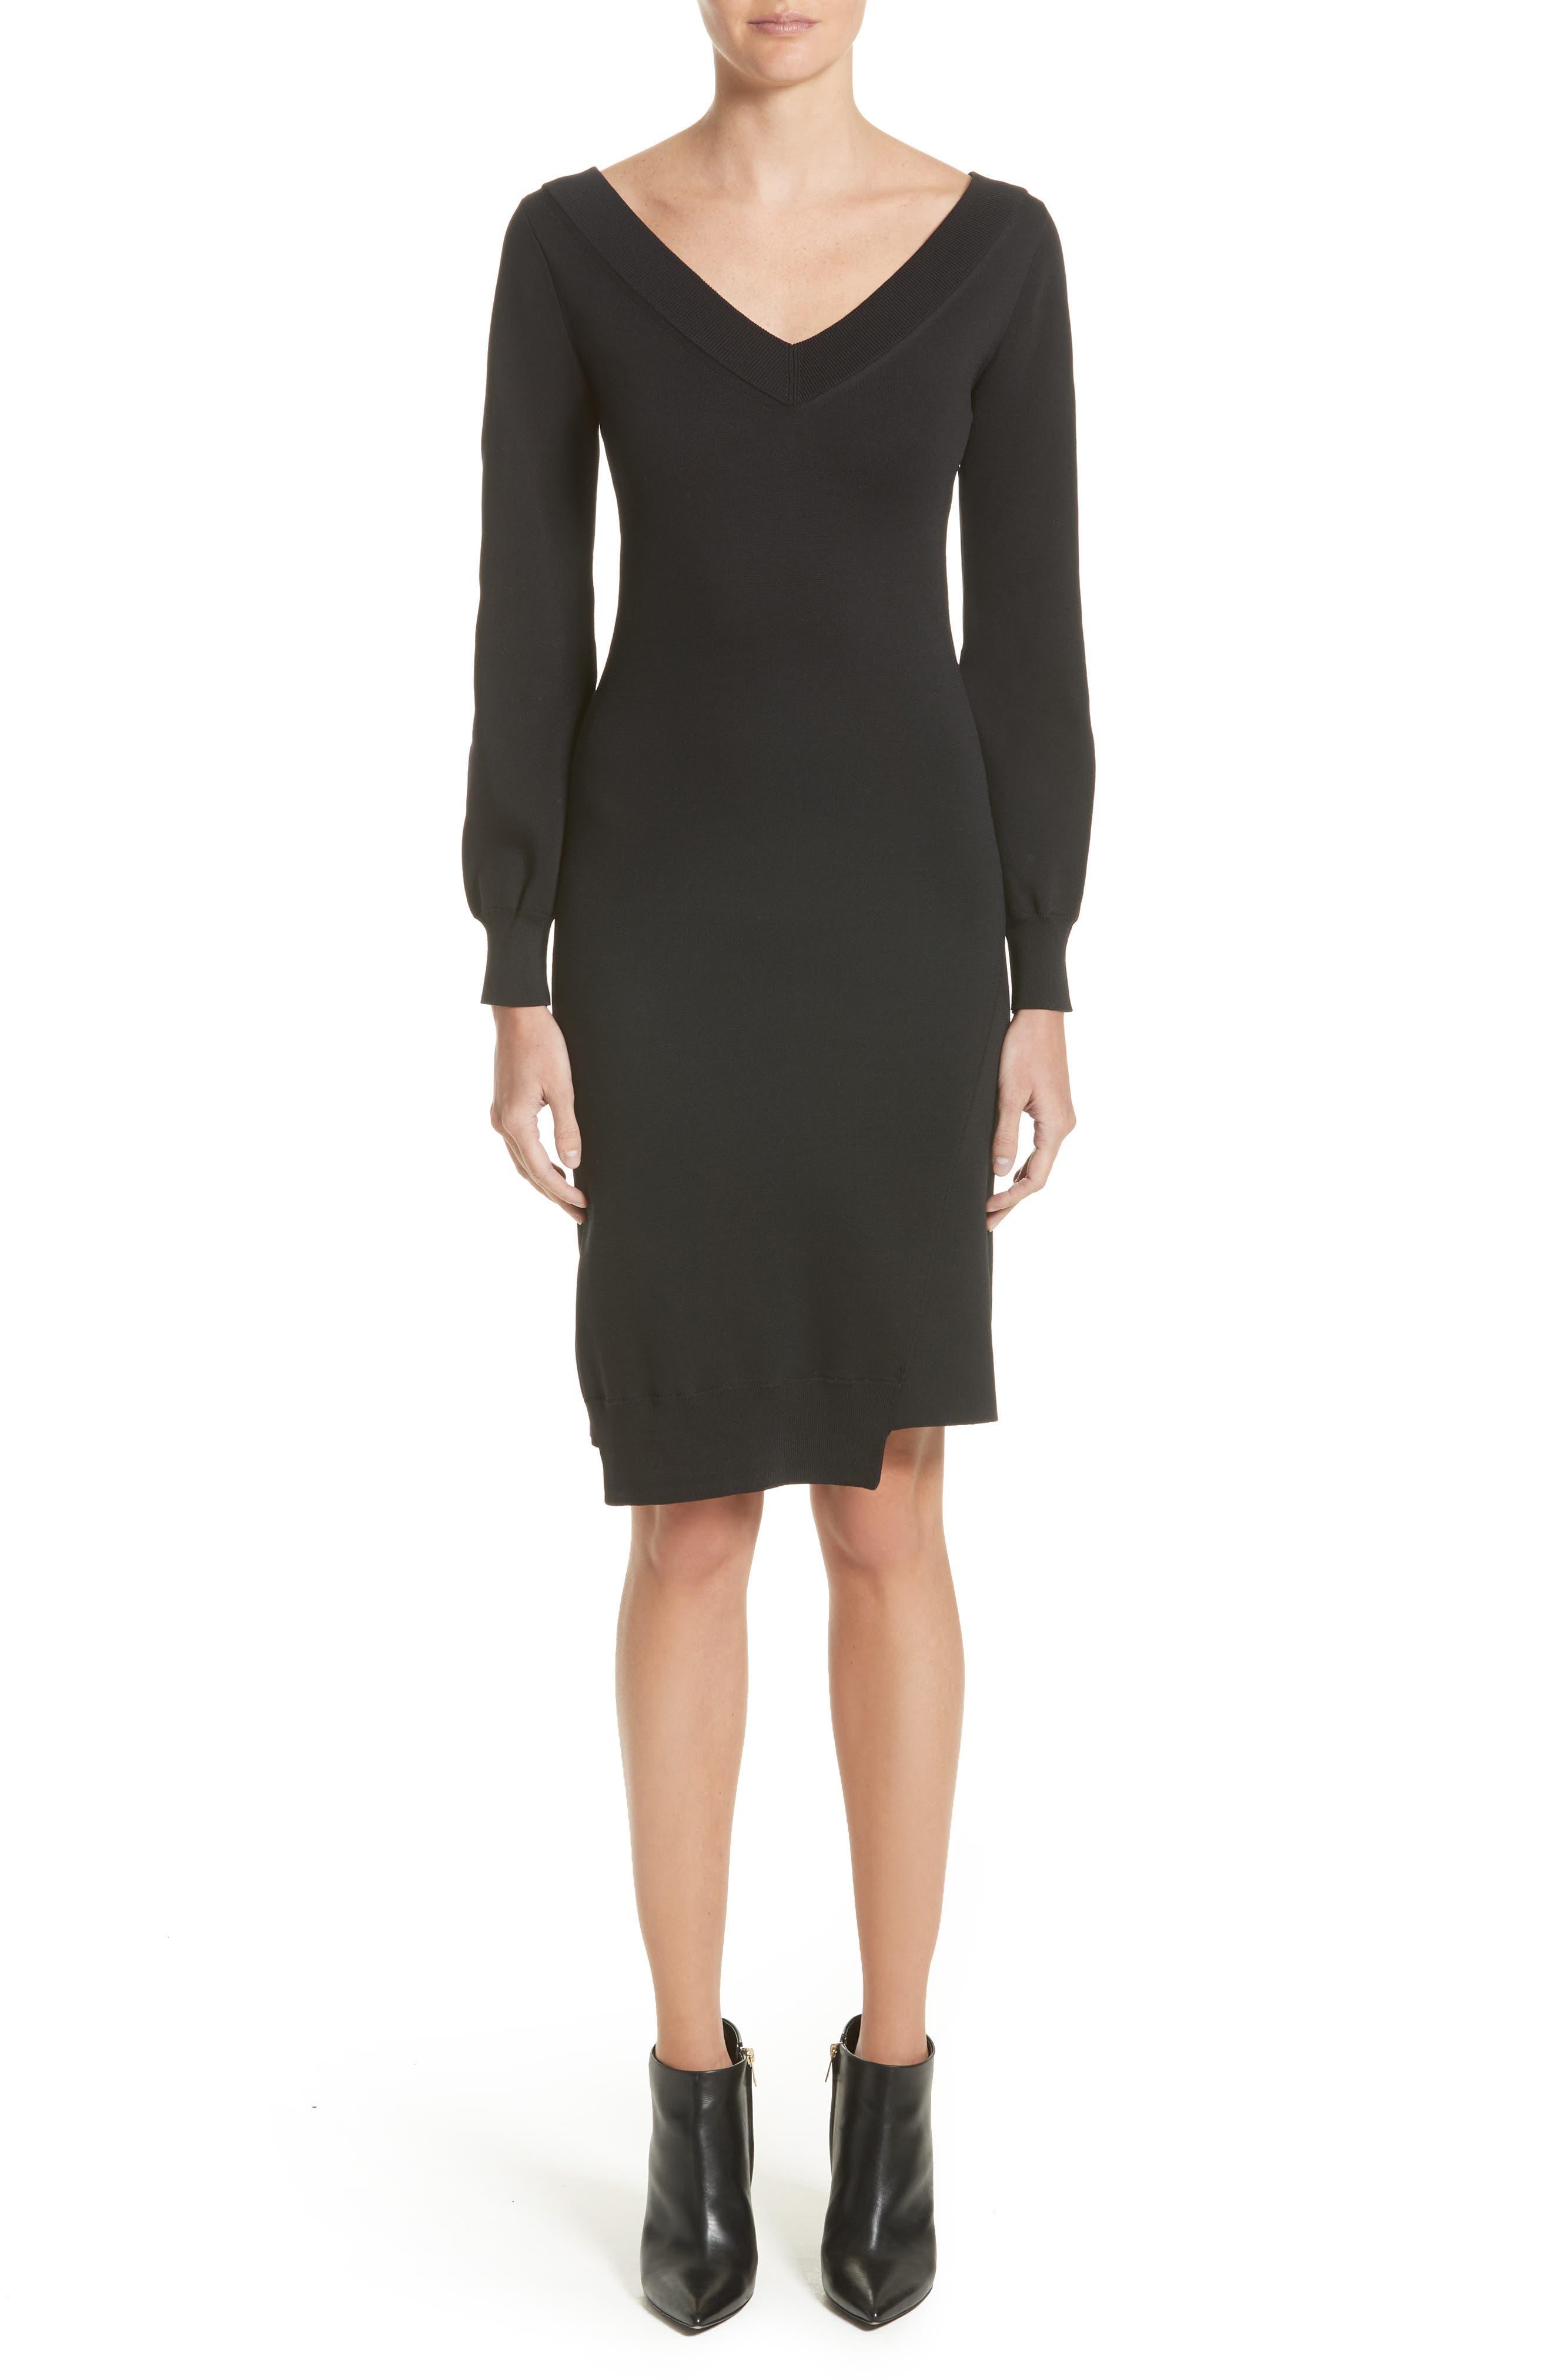 Alternate Image 1 Selected - Burberry Marro Knit Dress